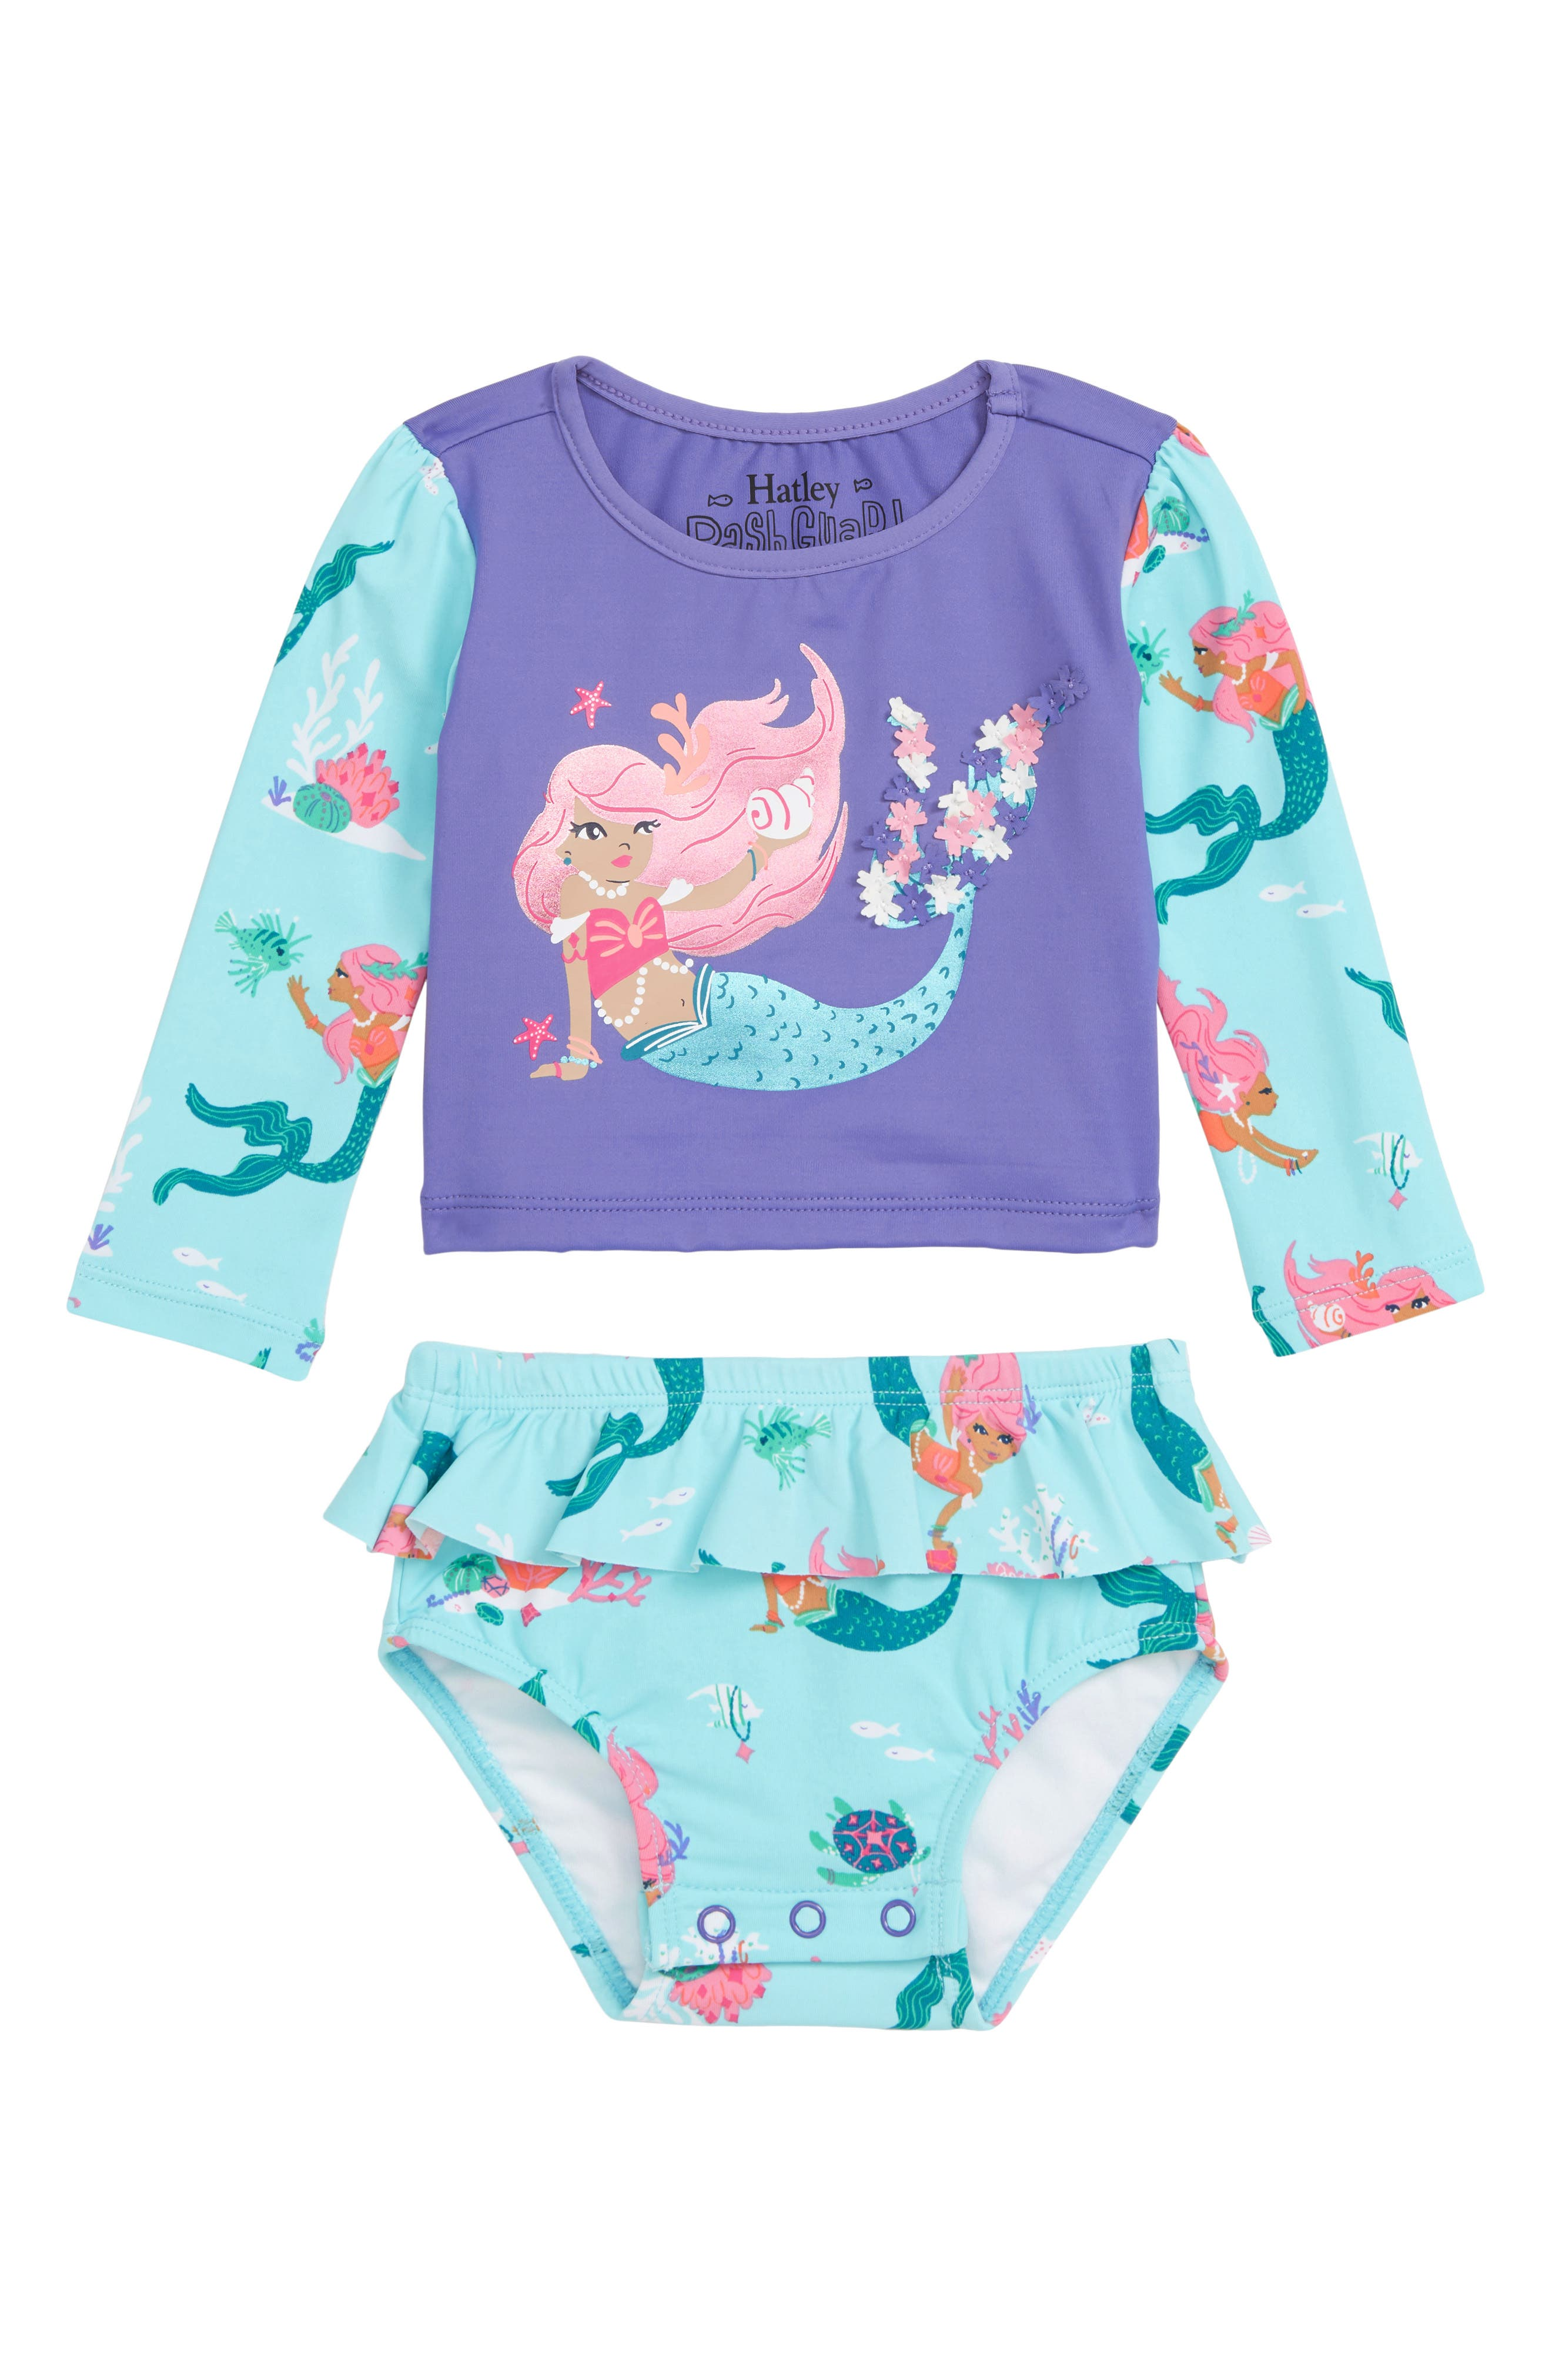 HATLEY Mermaid Tales Two-Piece Rashguard Swimsuit, Main, color, PURPLE